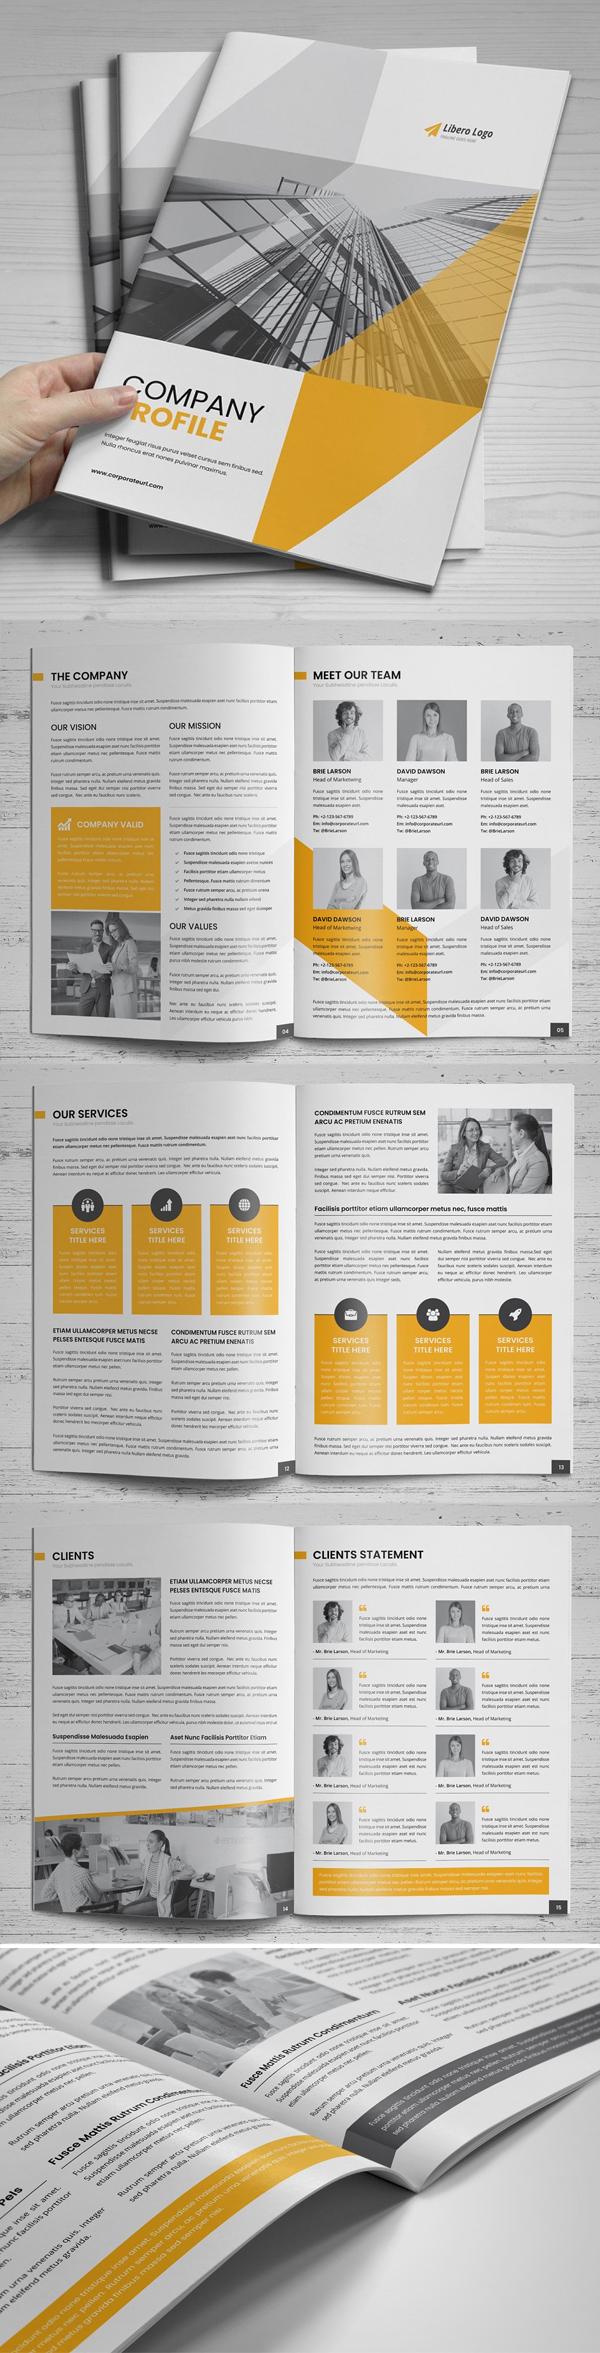 Creative Company Profile Brochure